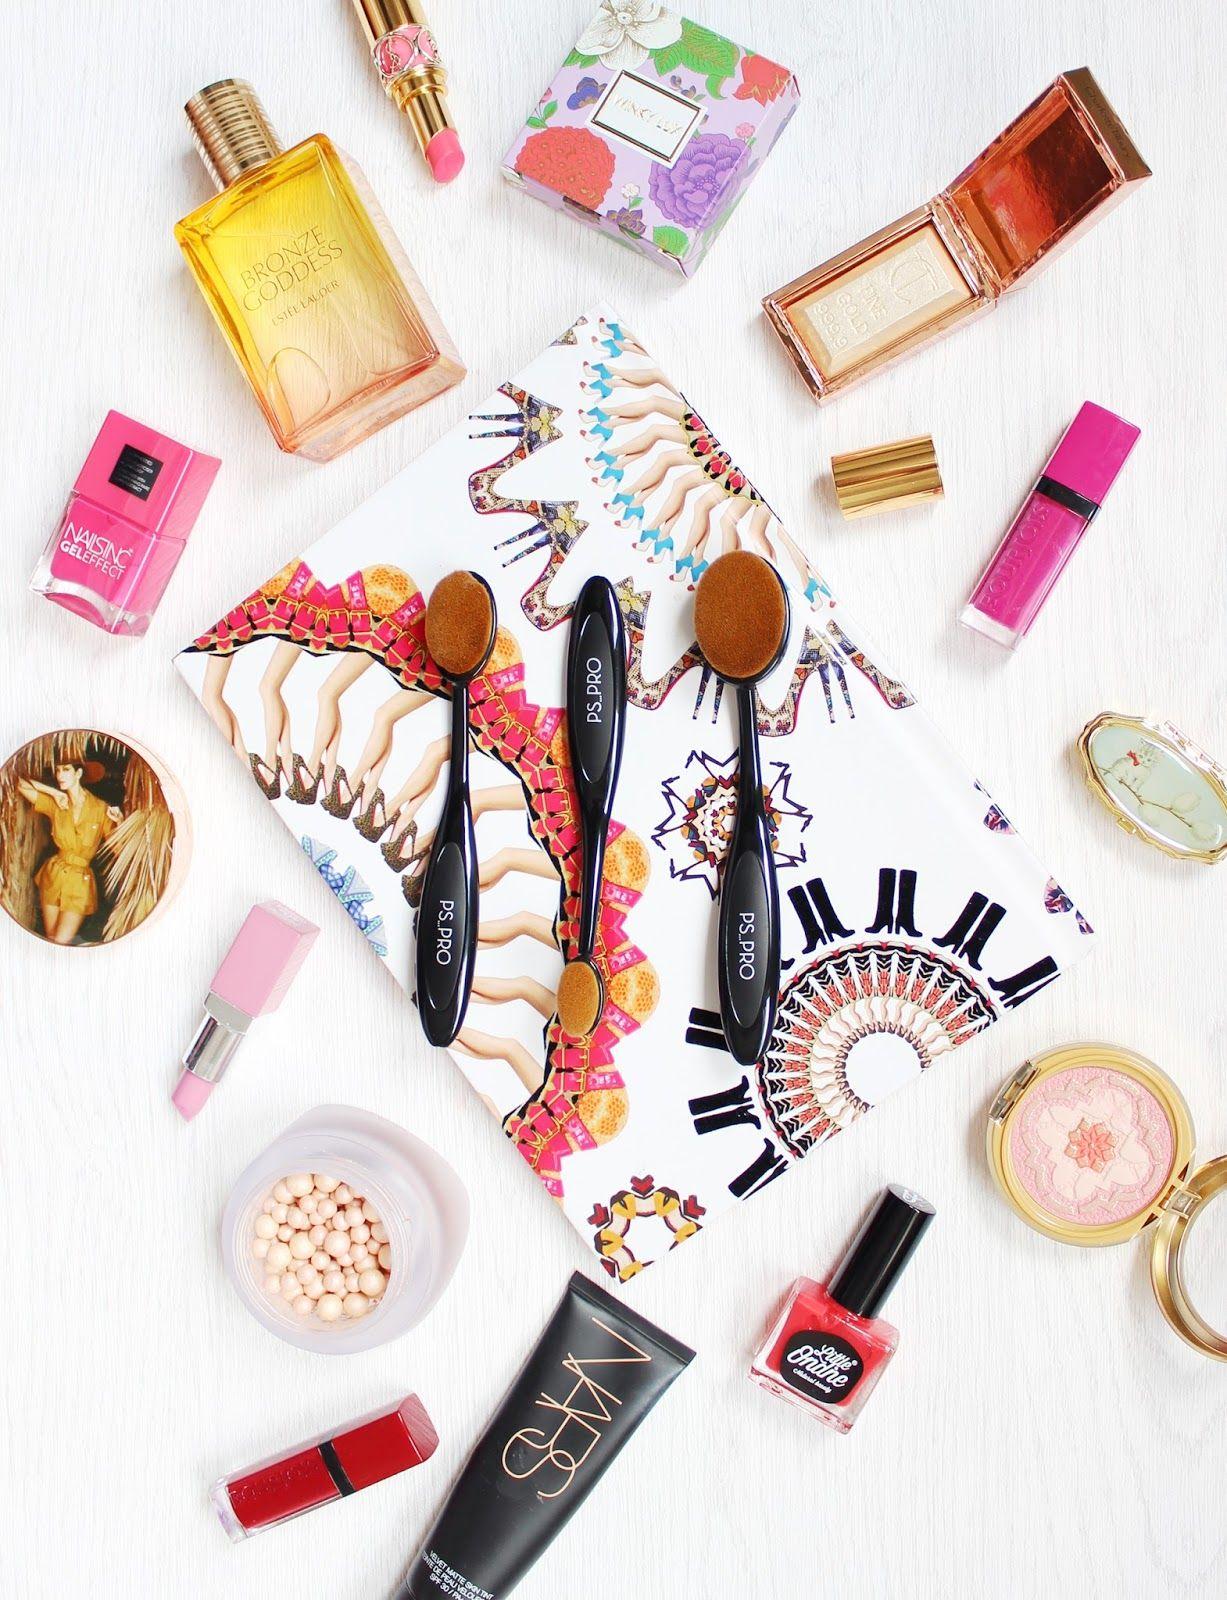 Primark PS...Pro Oval Blending Makeup Brushes an